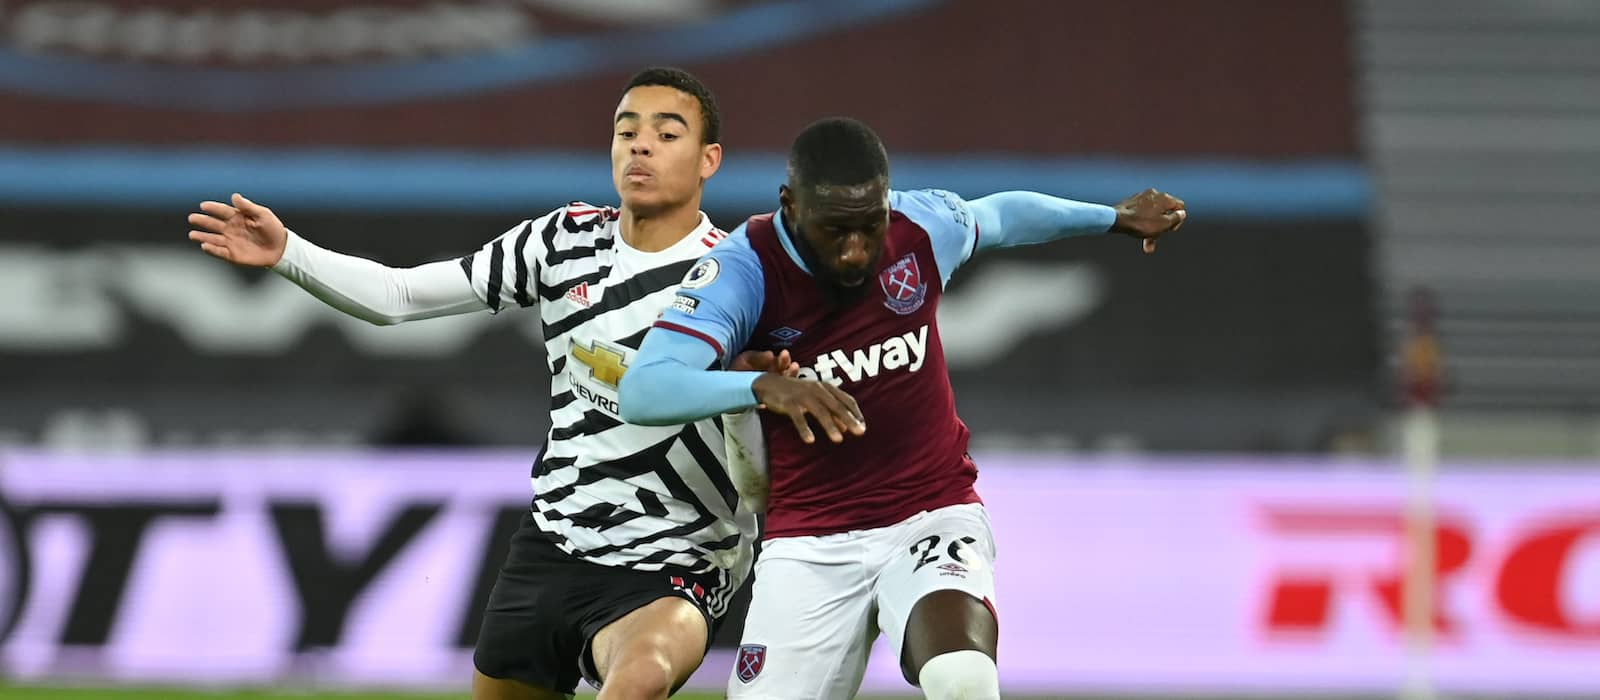 Mason Greenwood nets record-equalling goal for Manchester United vs West Ham